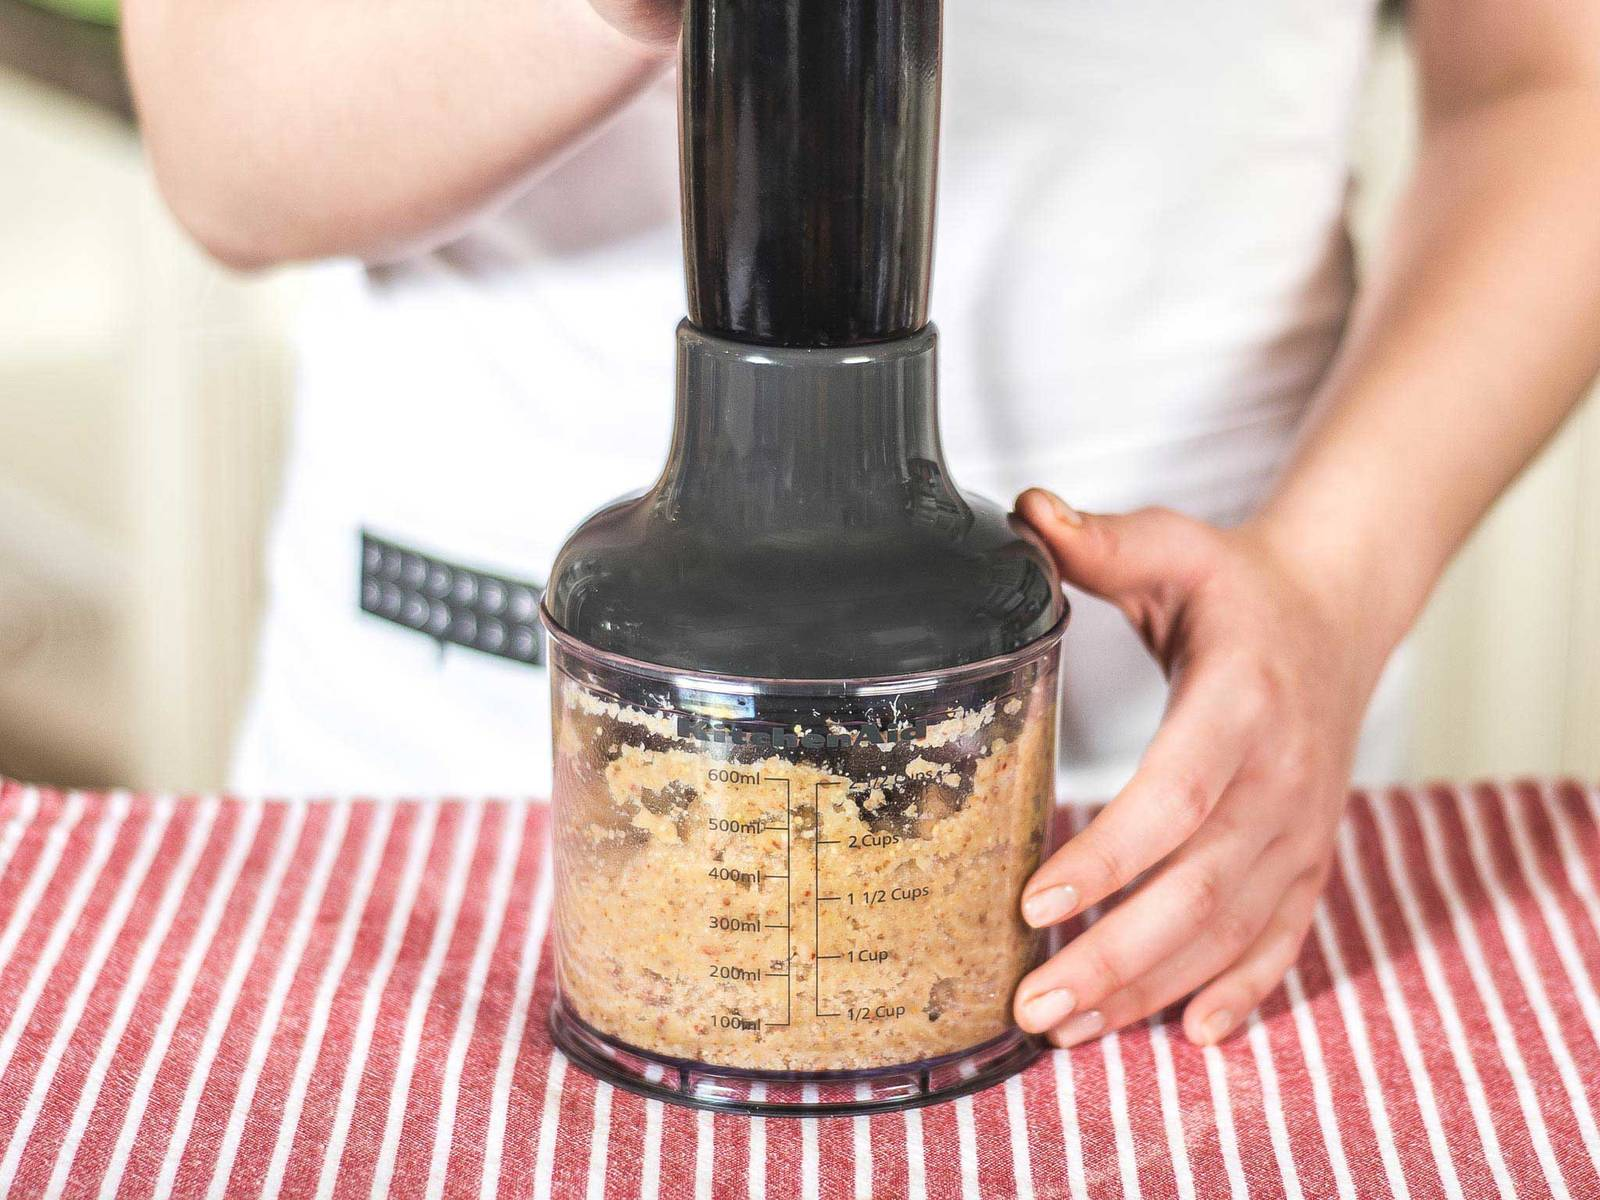 Stir remaining olive oil into the pesto.